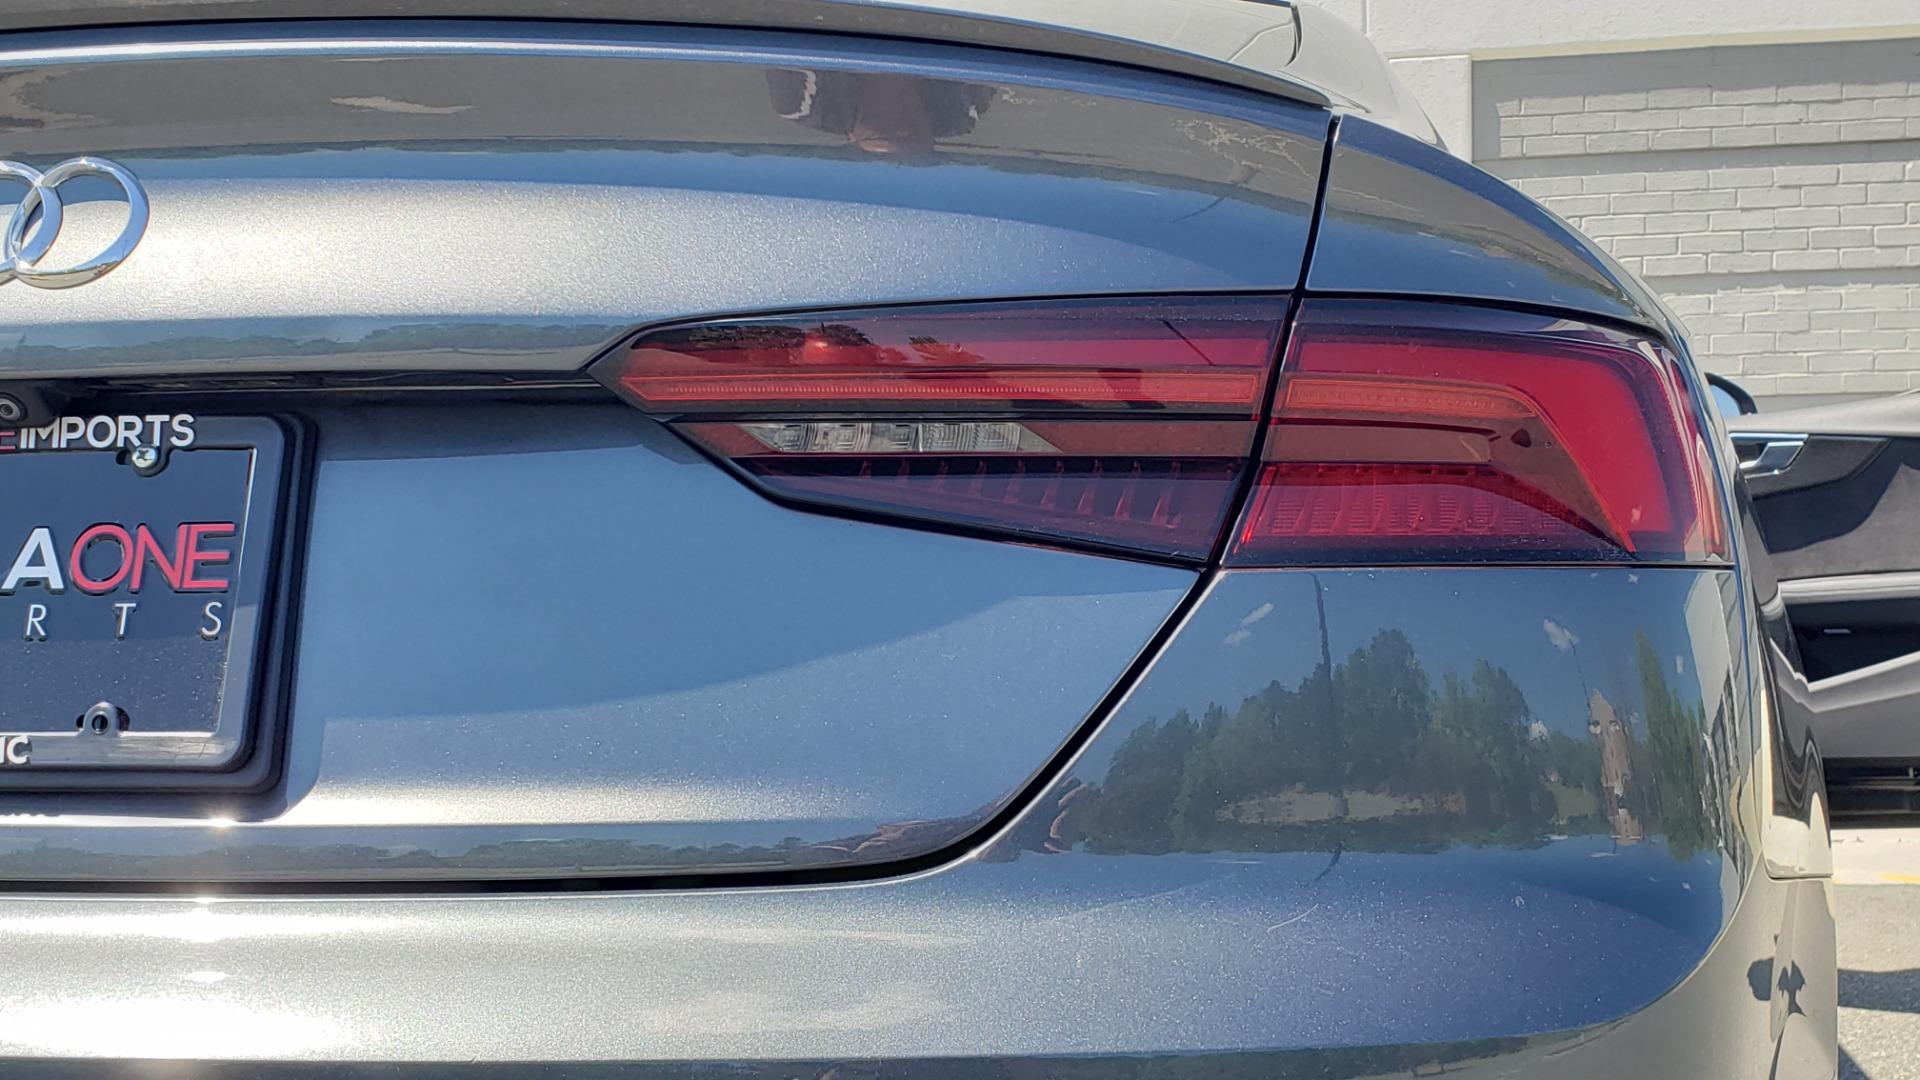 Used 2018 Audi S5 SPORTBACK PRESTIGE S-SPORT / NAV / SUNROOF / HUD / B&O SND / REARVIEW for sale $48,995 at Formula Imports in Charlotte NC 28227 29